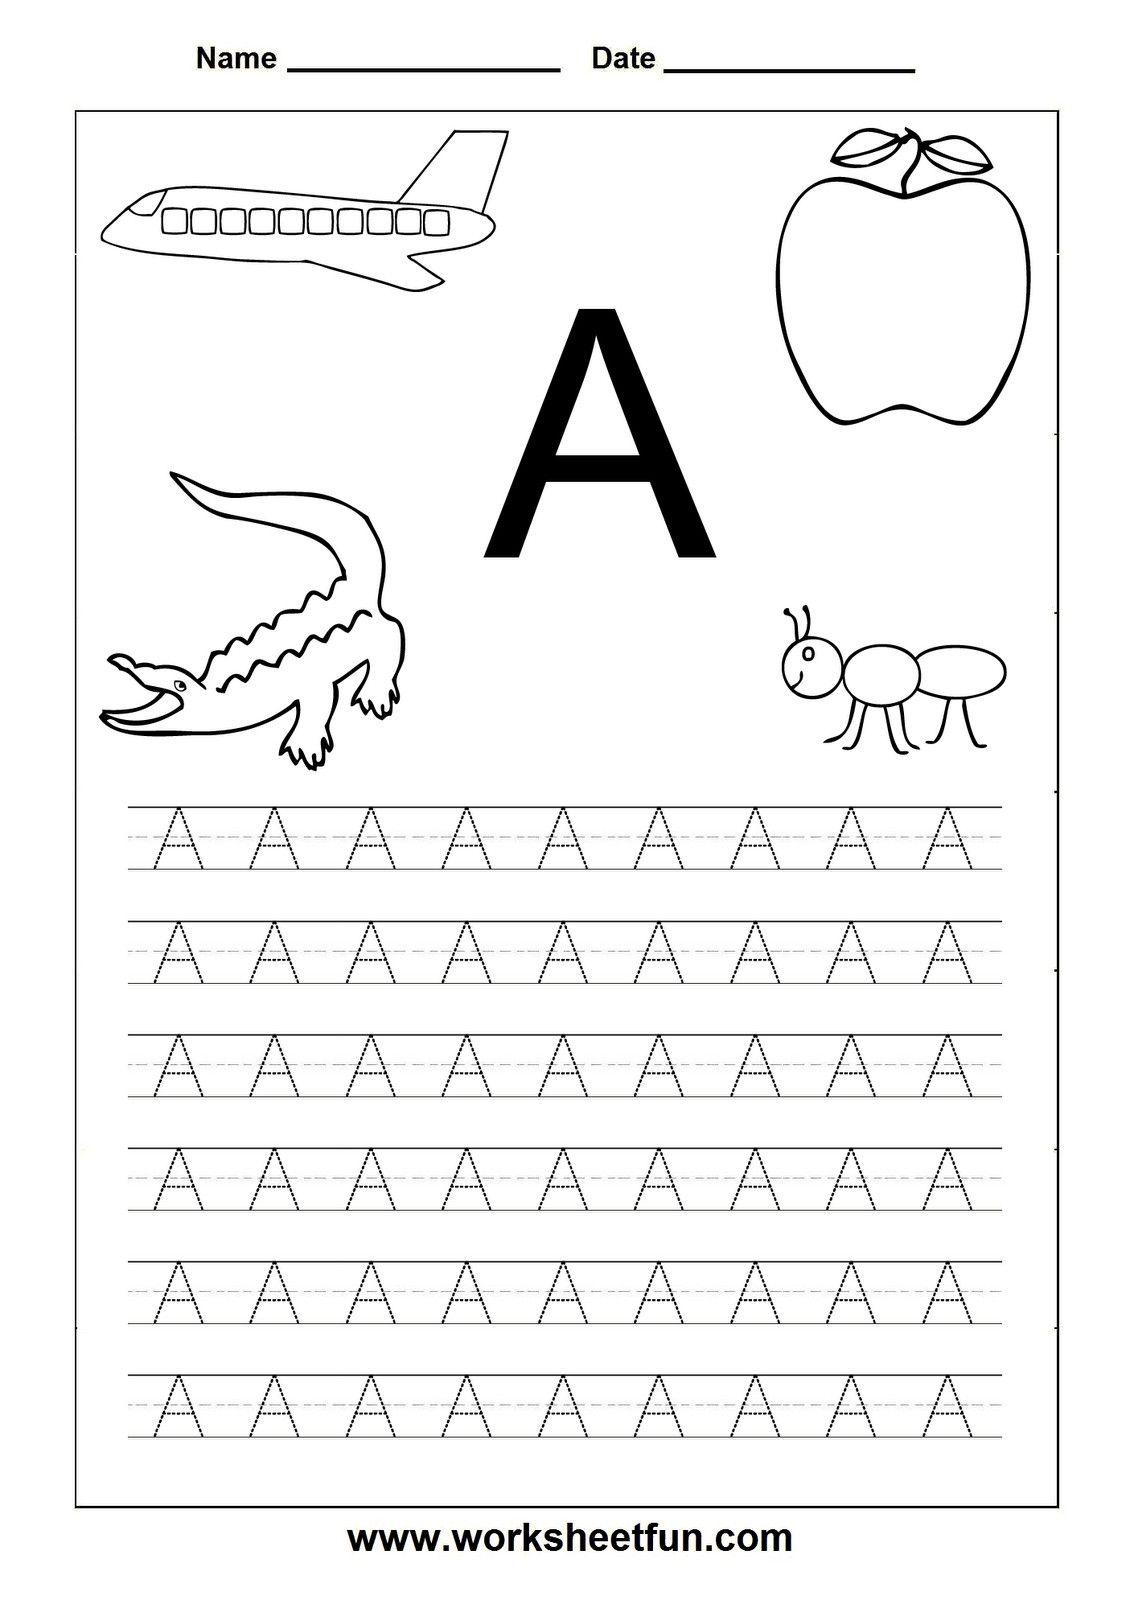 Printable Letters For Preschoolers - Paul's House | Alphabet inside Alphabet Worksheets Free Printables